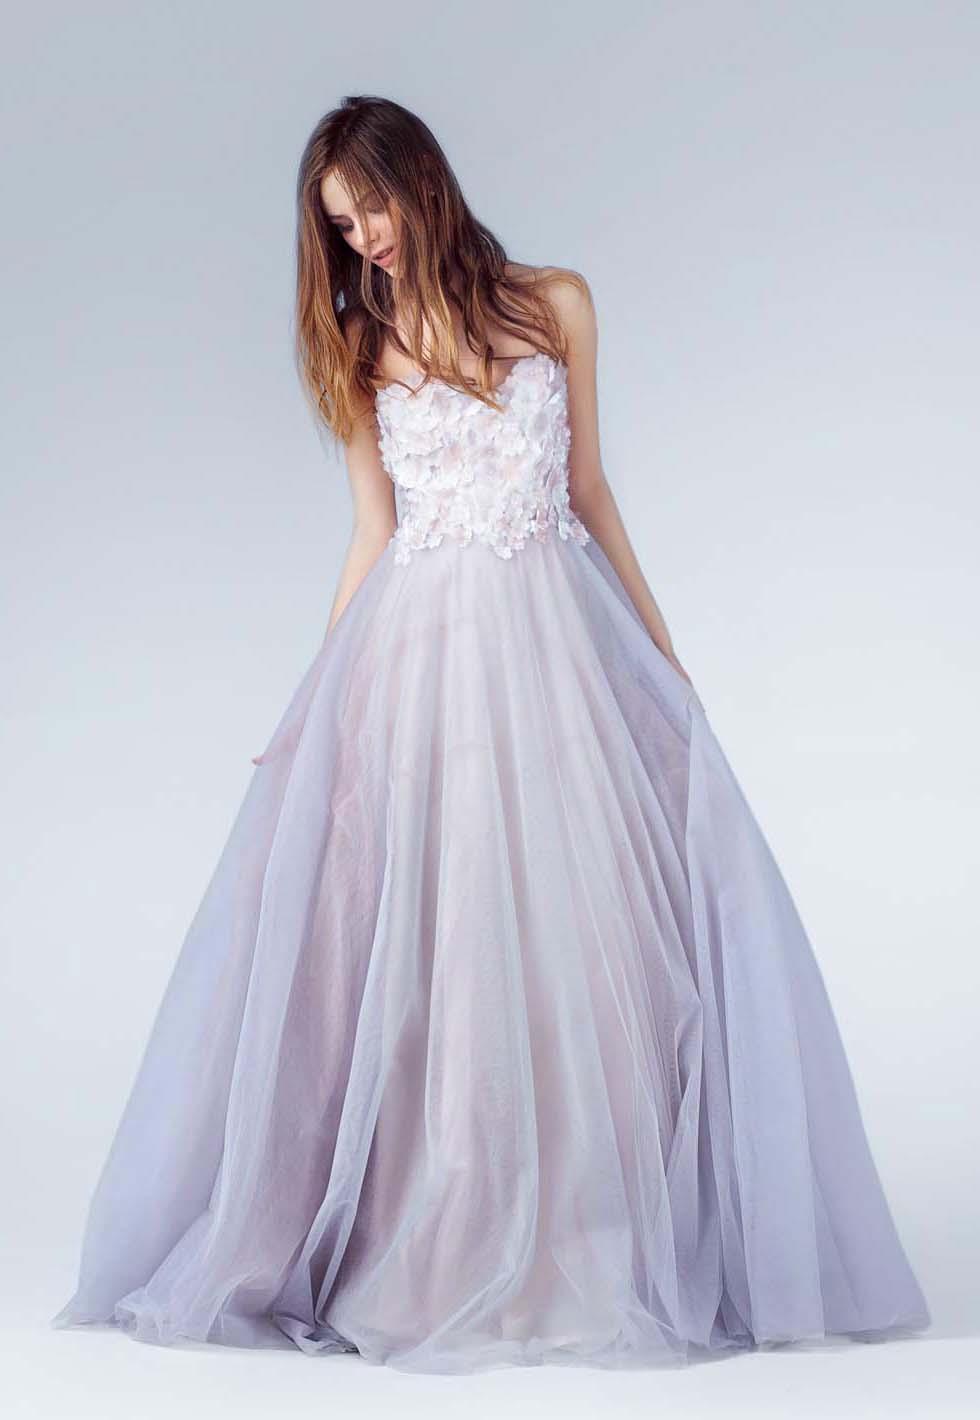 Brautkleid-Farbe Flieder Yoo Studio